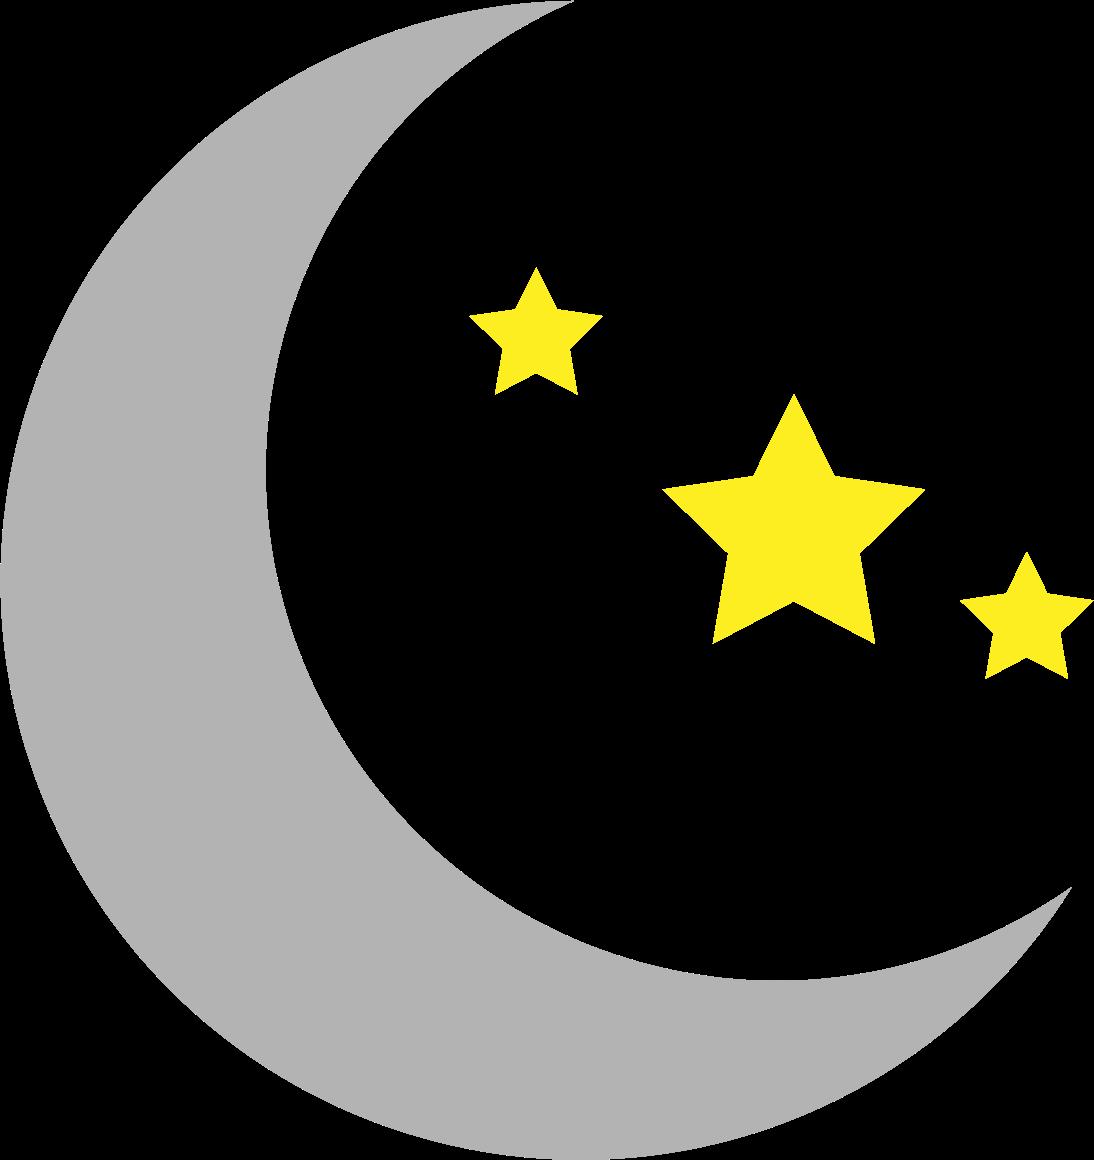 1094x1160 Stars clipart moon